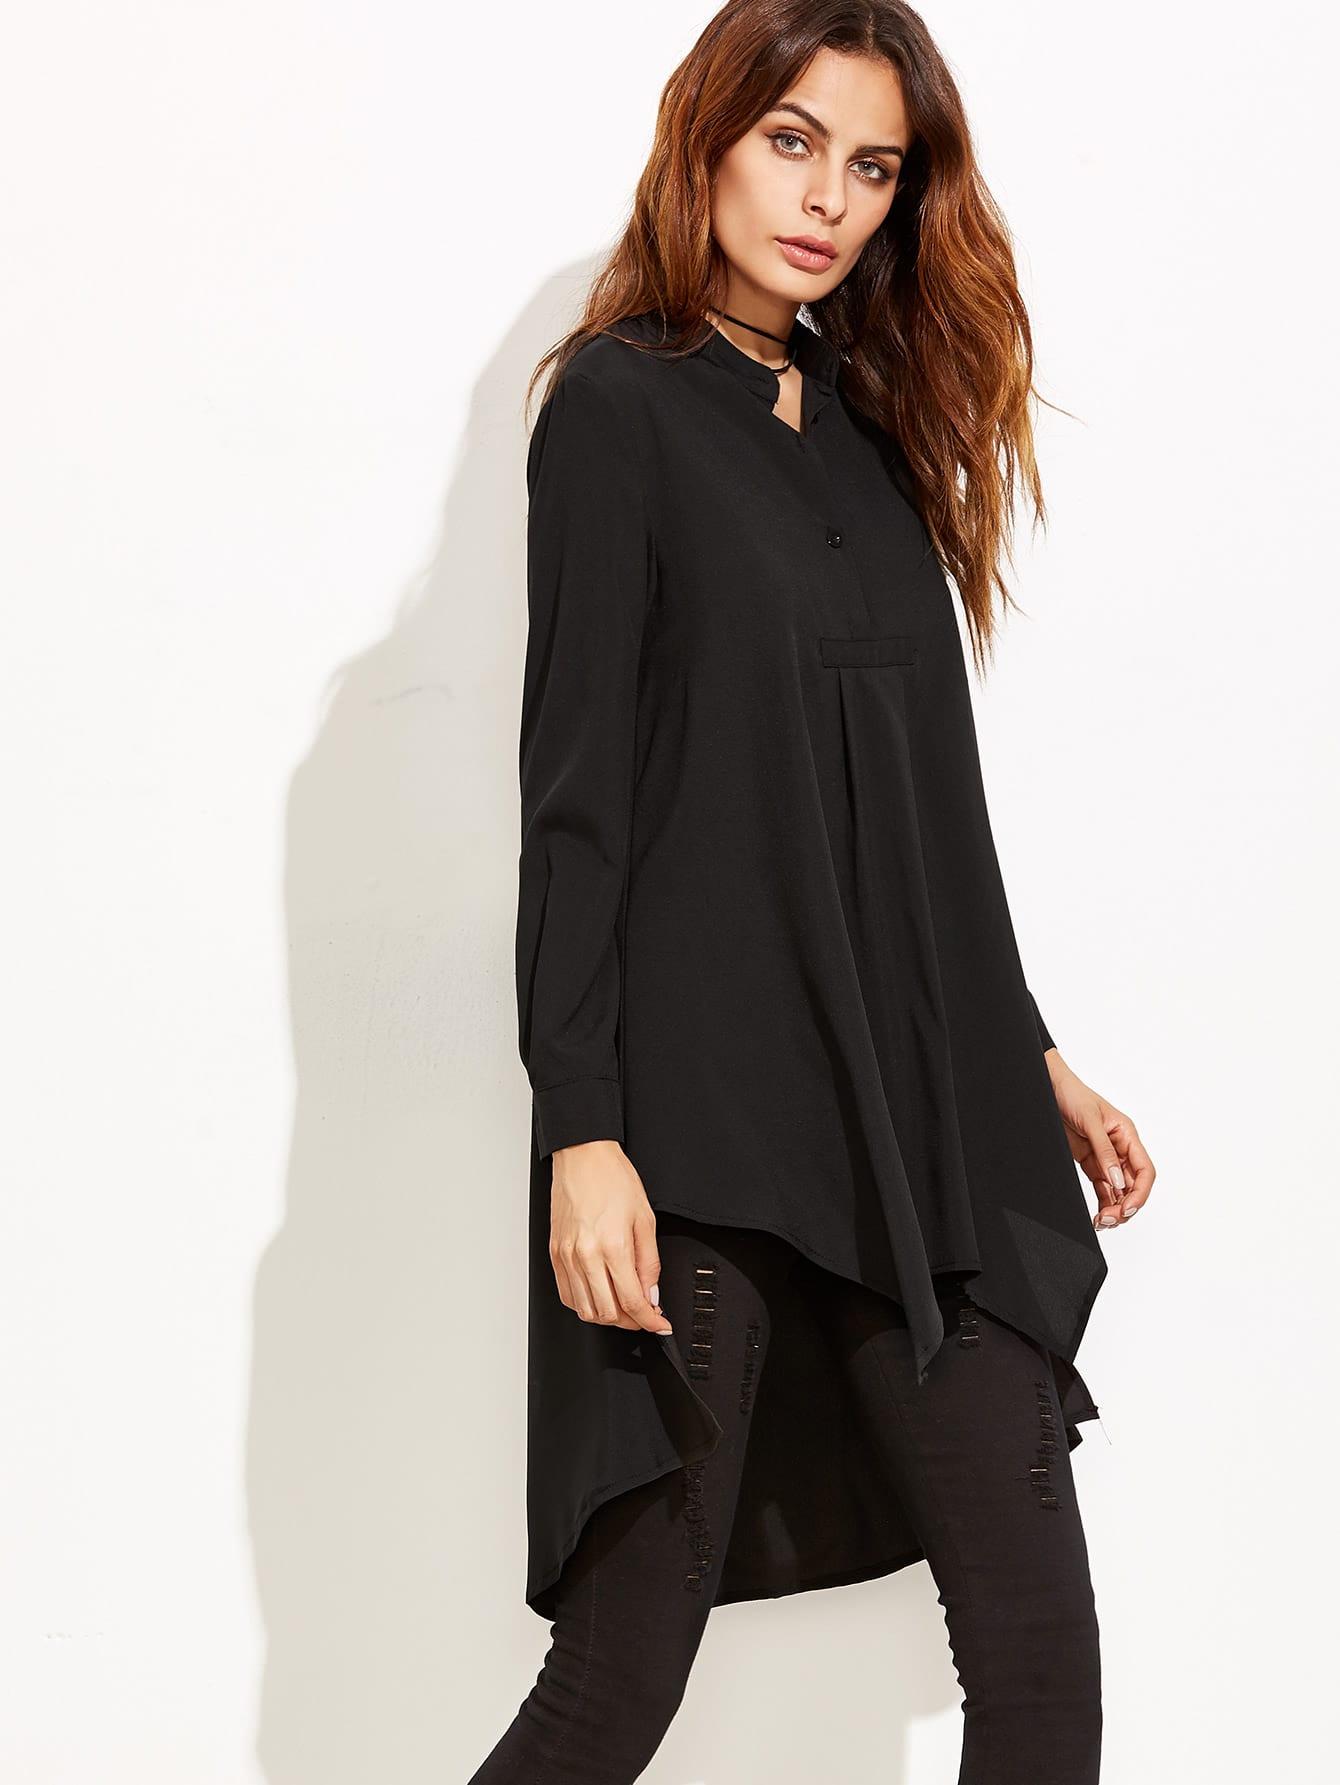 blouse160906102_2